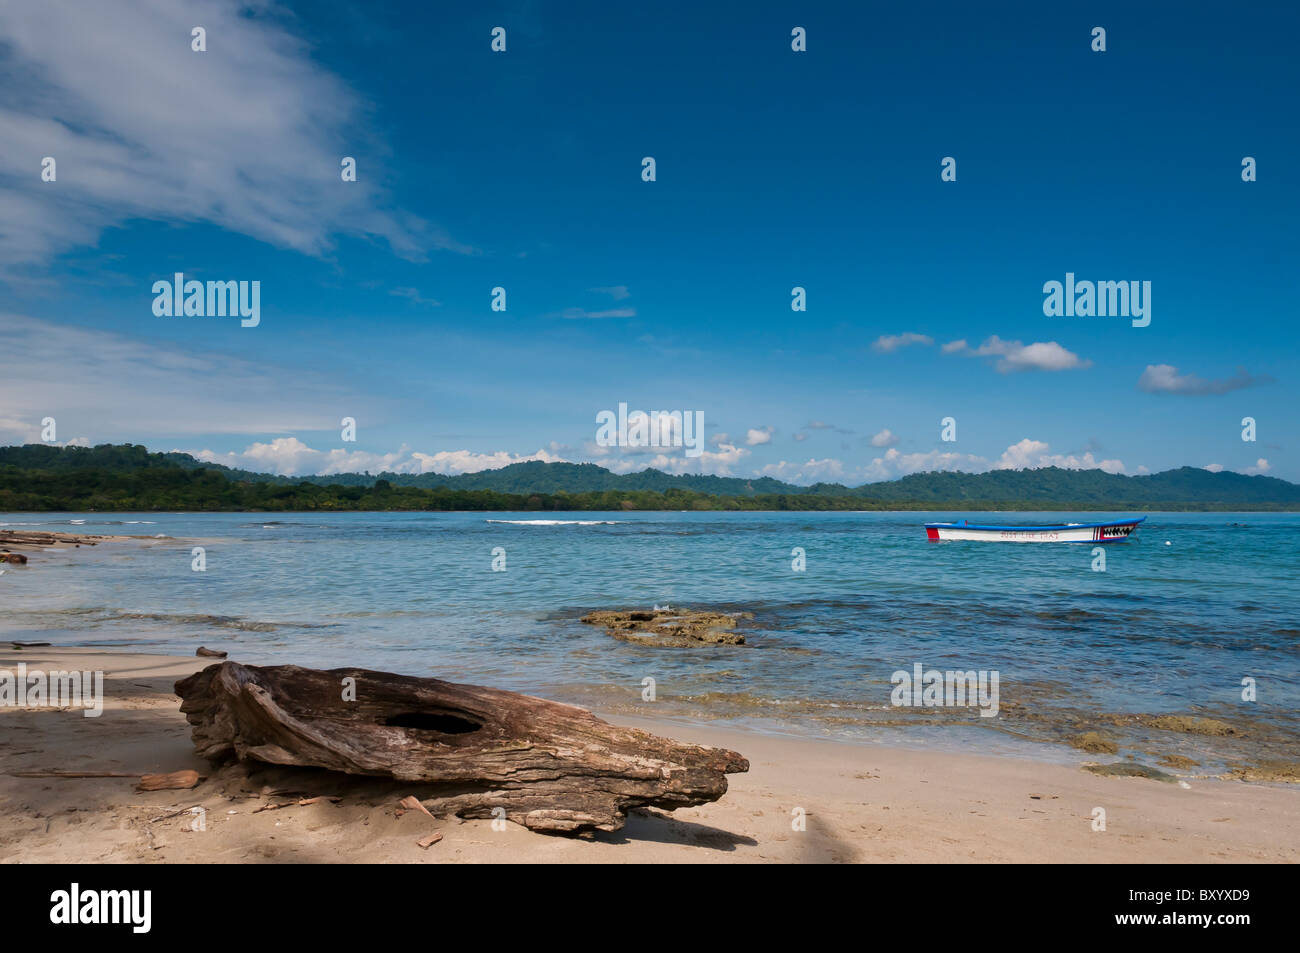 Puerto Viejo Strand Karibik Küste Costa Rica Stockbild